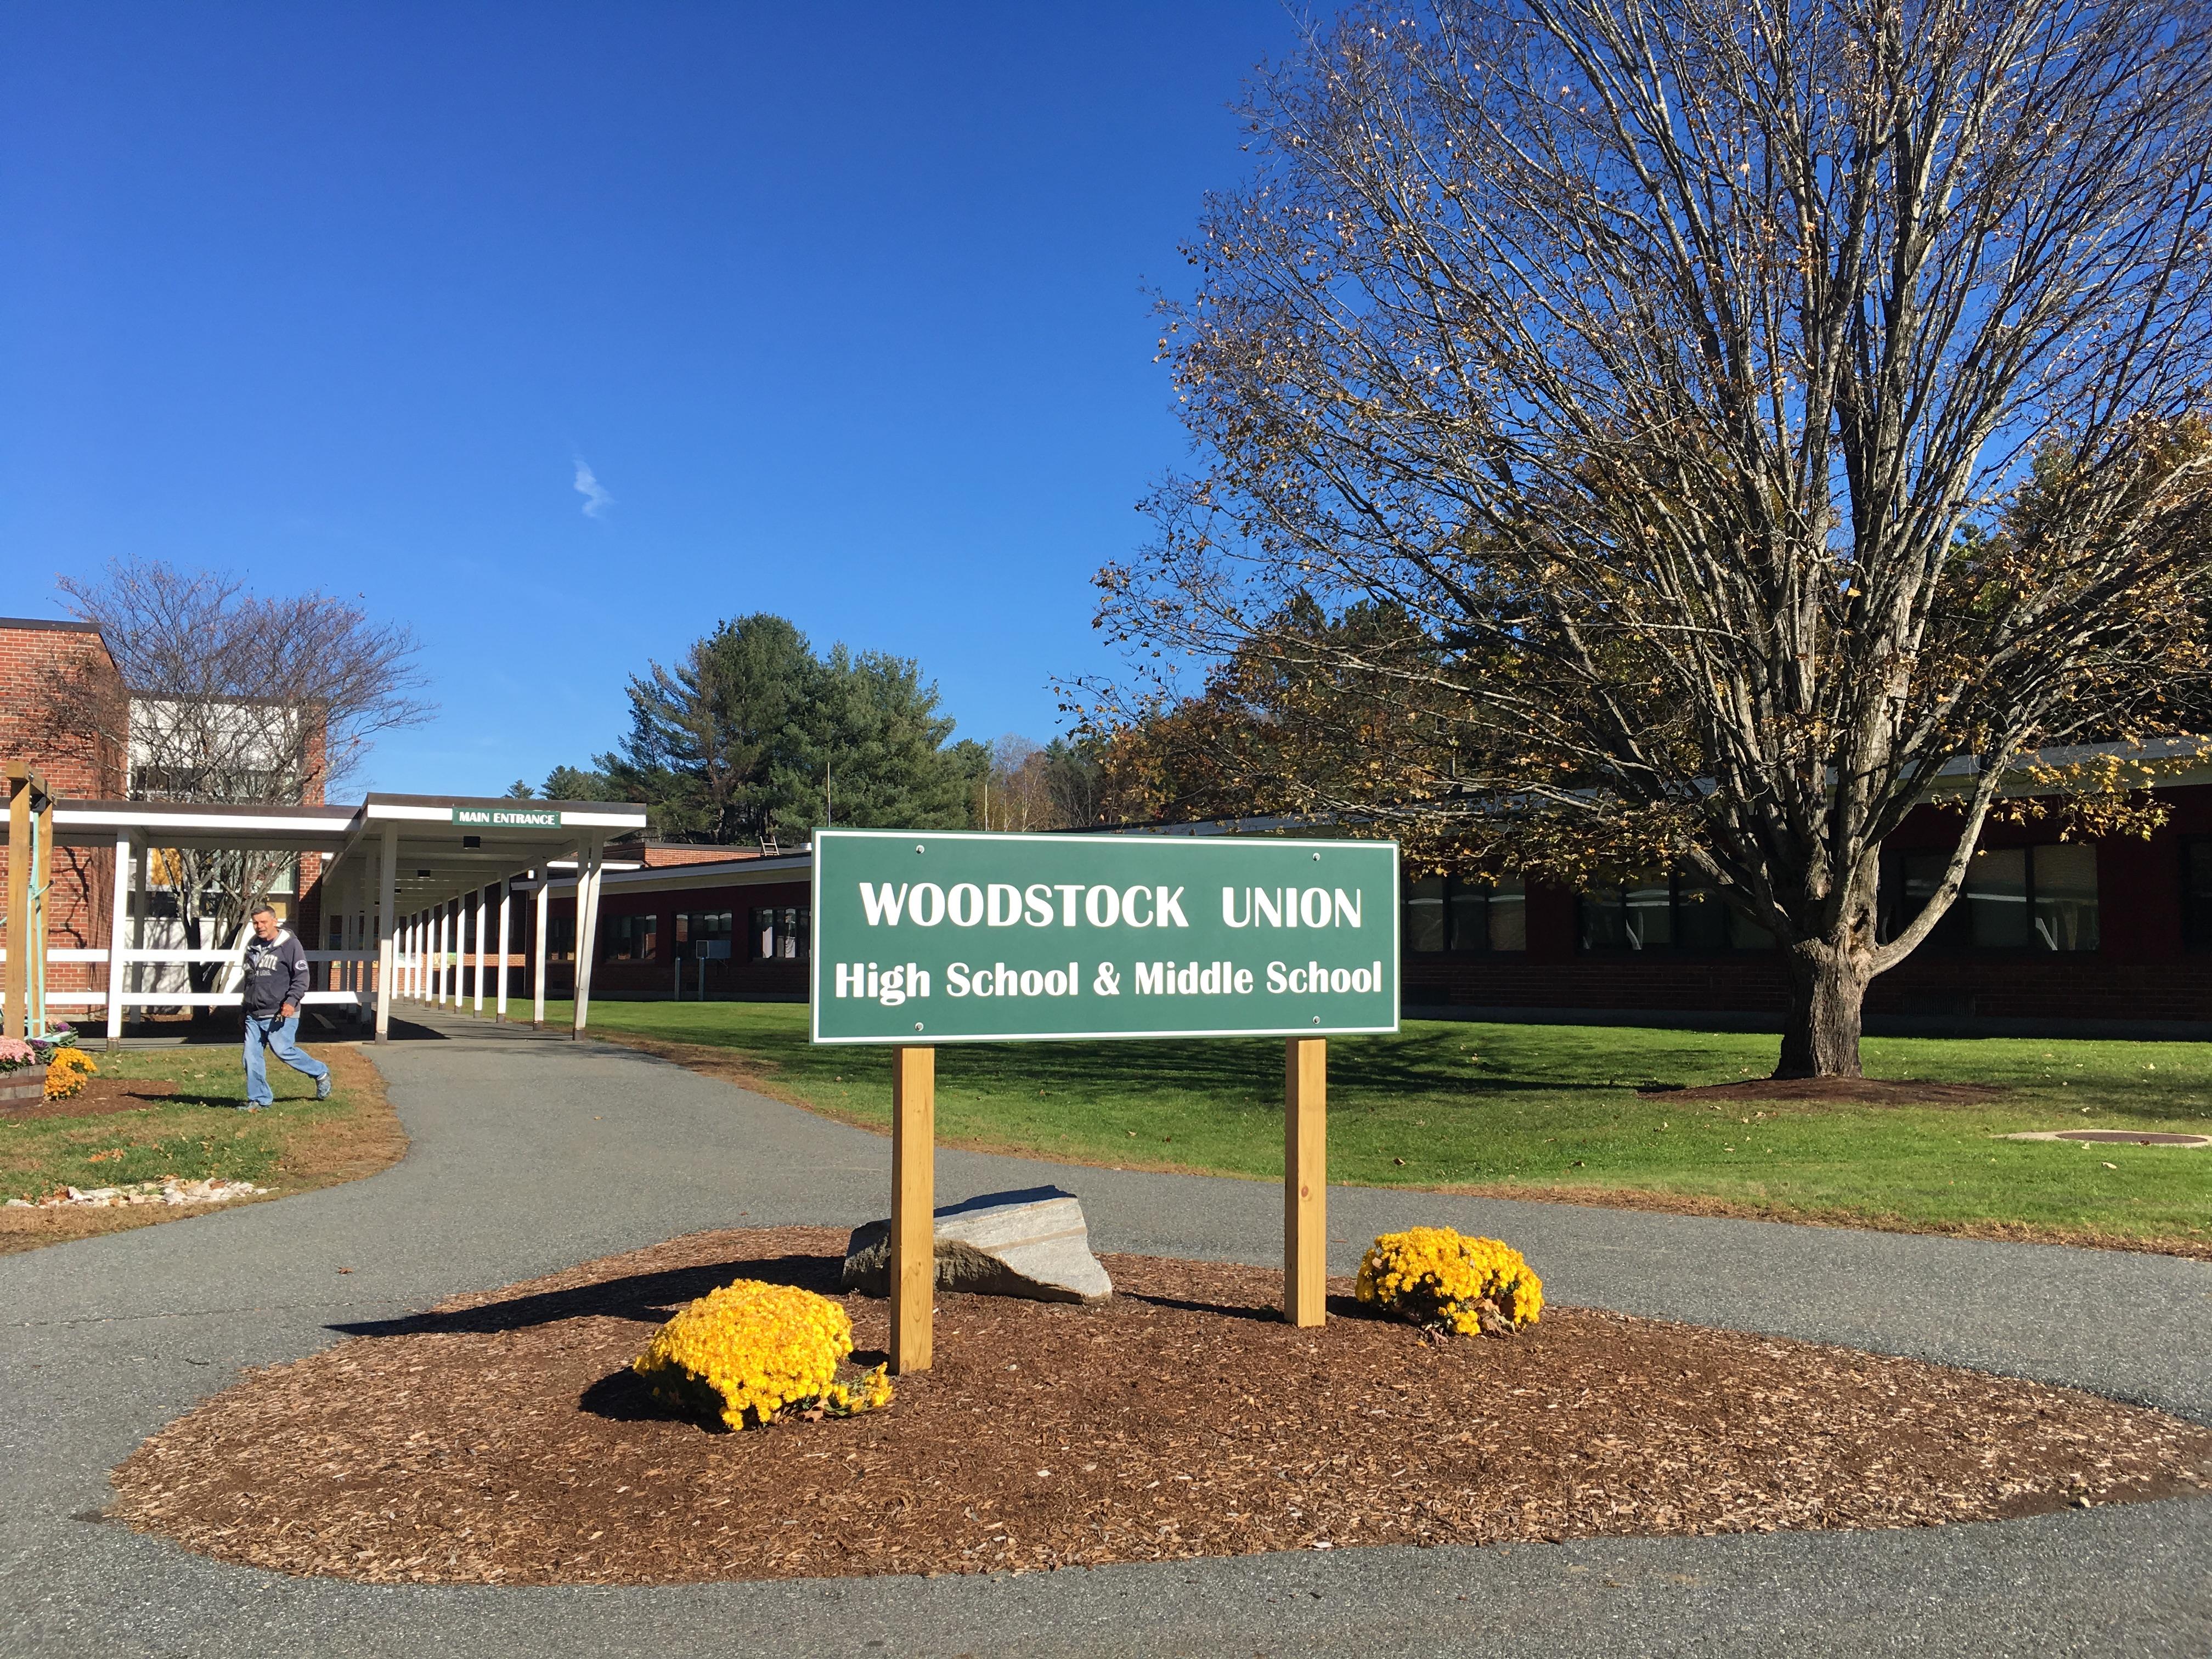 Fantastic Woodstock Union High School Wikipedia Download Free Architecture Designs Scobabritishbridgeorg